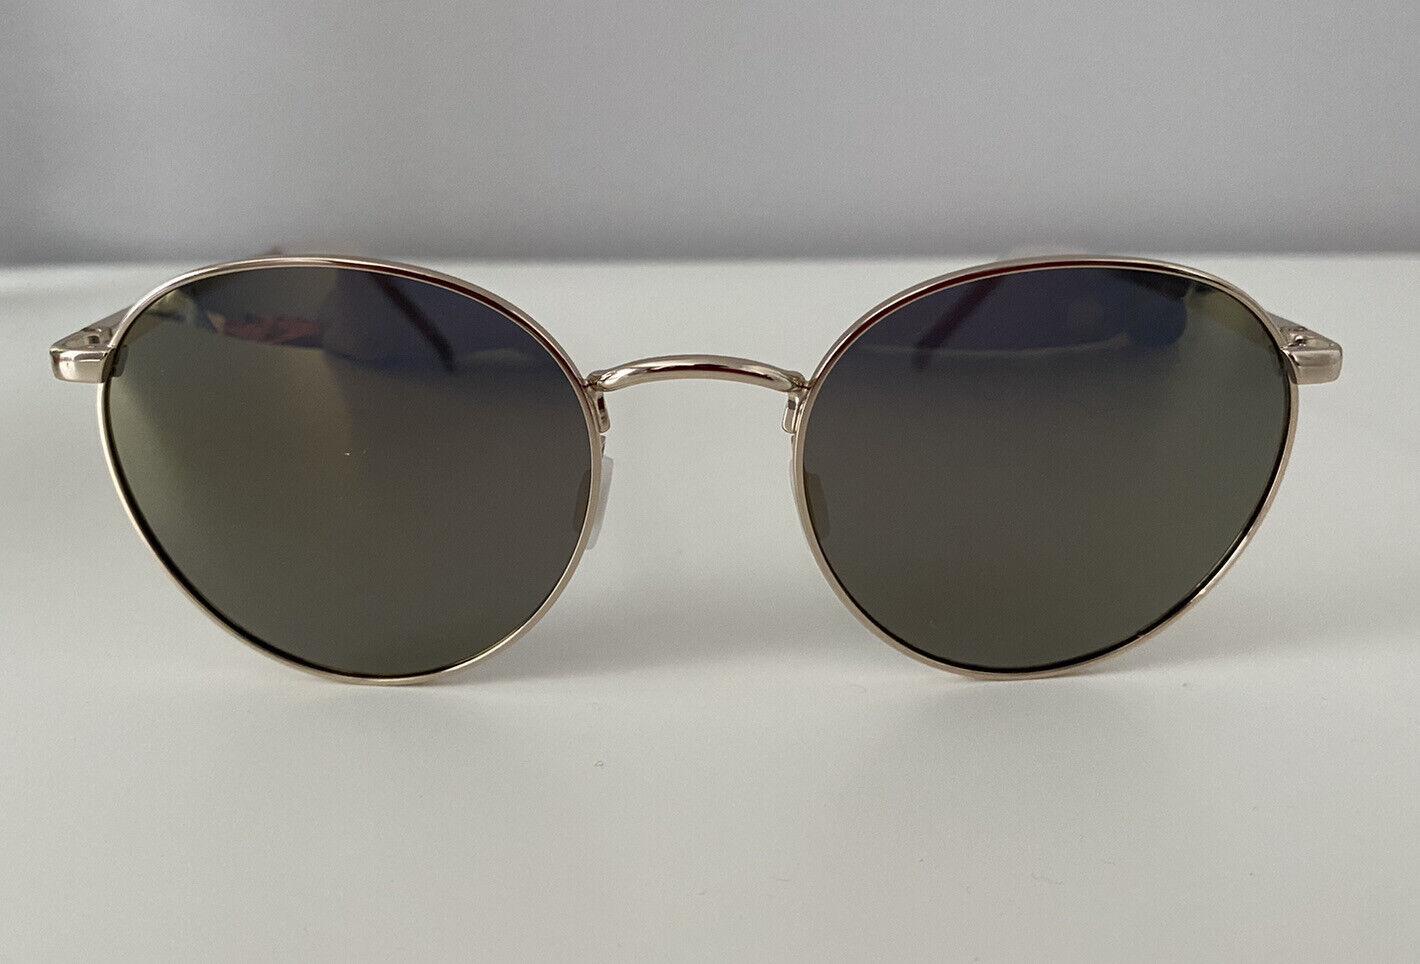 Eco By Modo Belize Gold Sunglasses